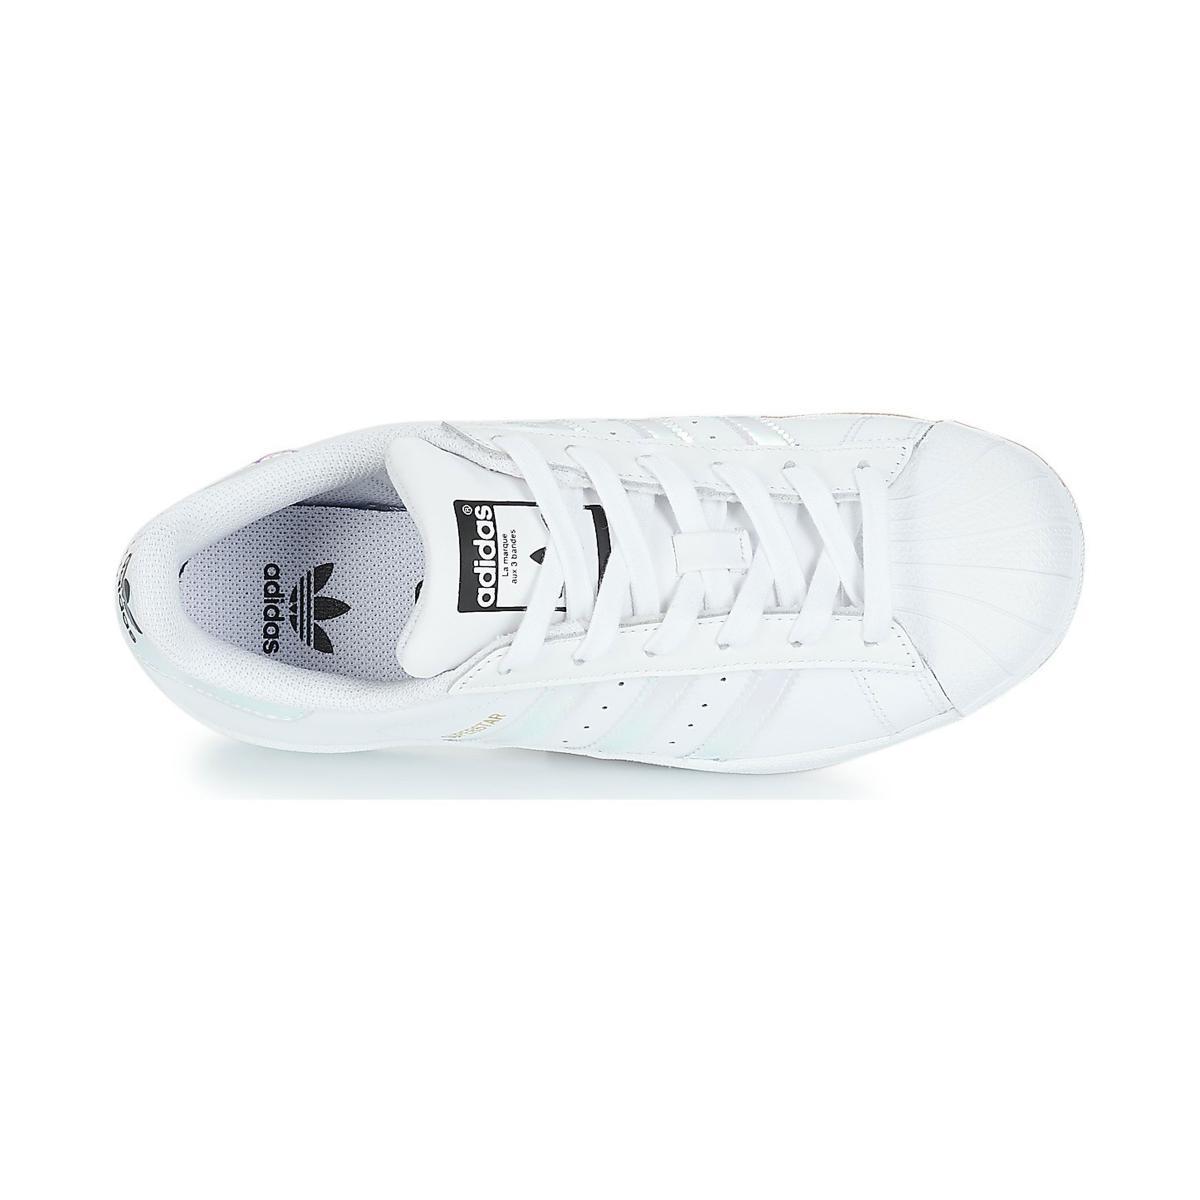 Scarpe Sneakers Adidas Superstar J da ragazza rif. AQ6278